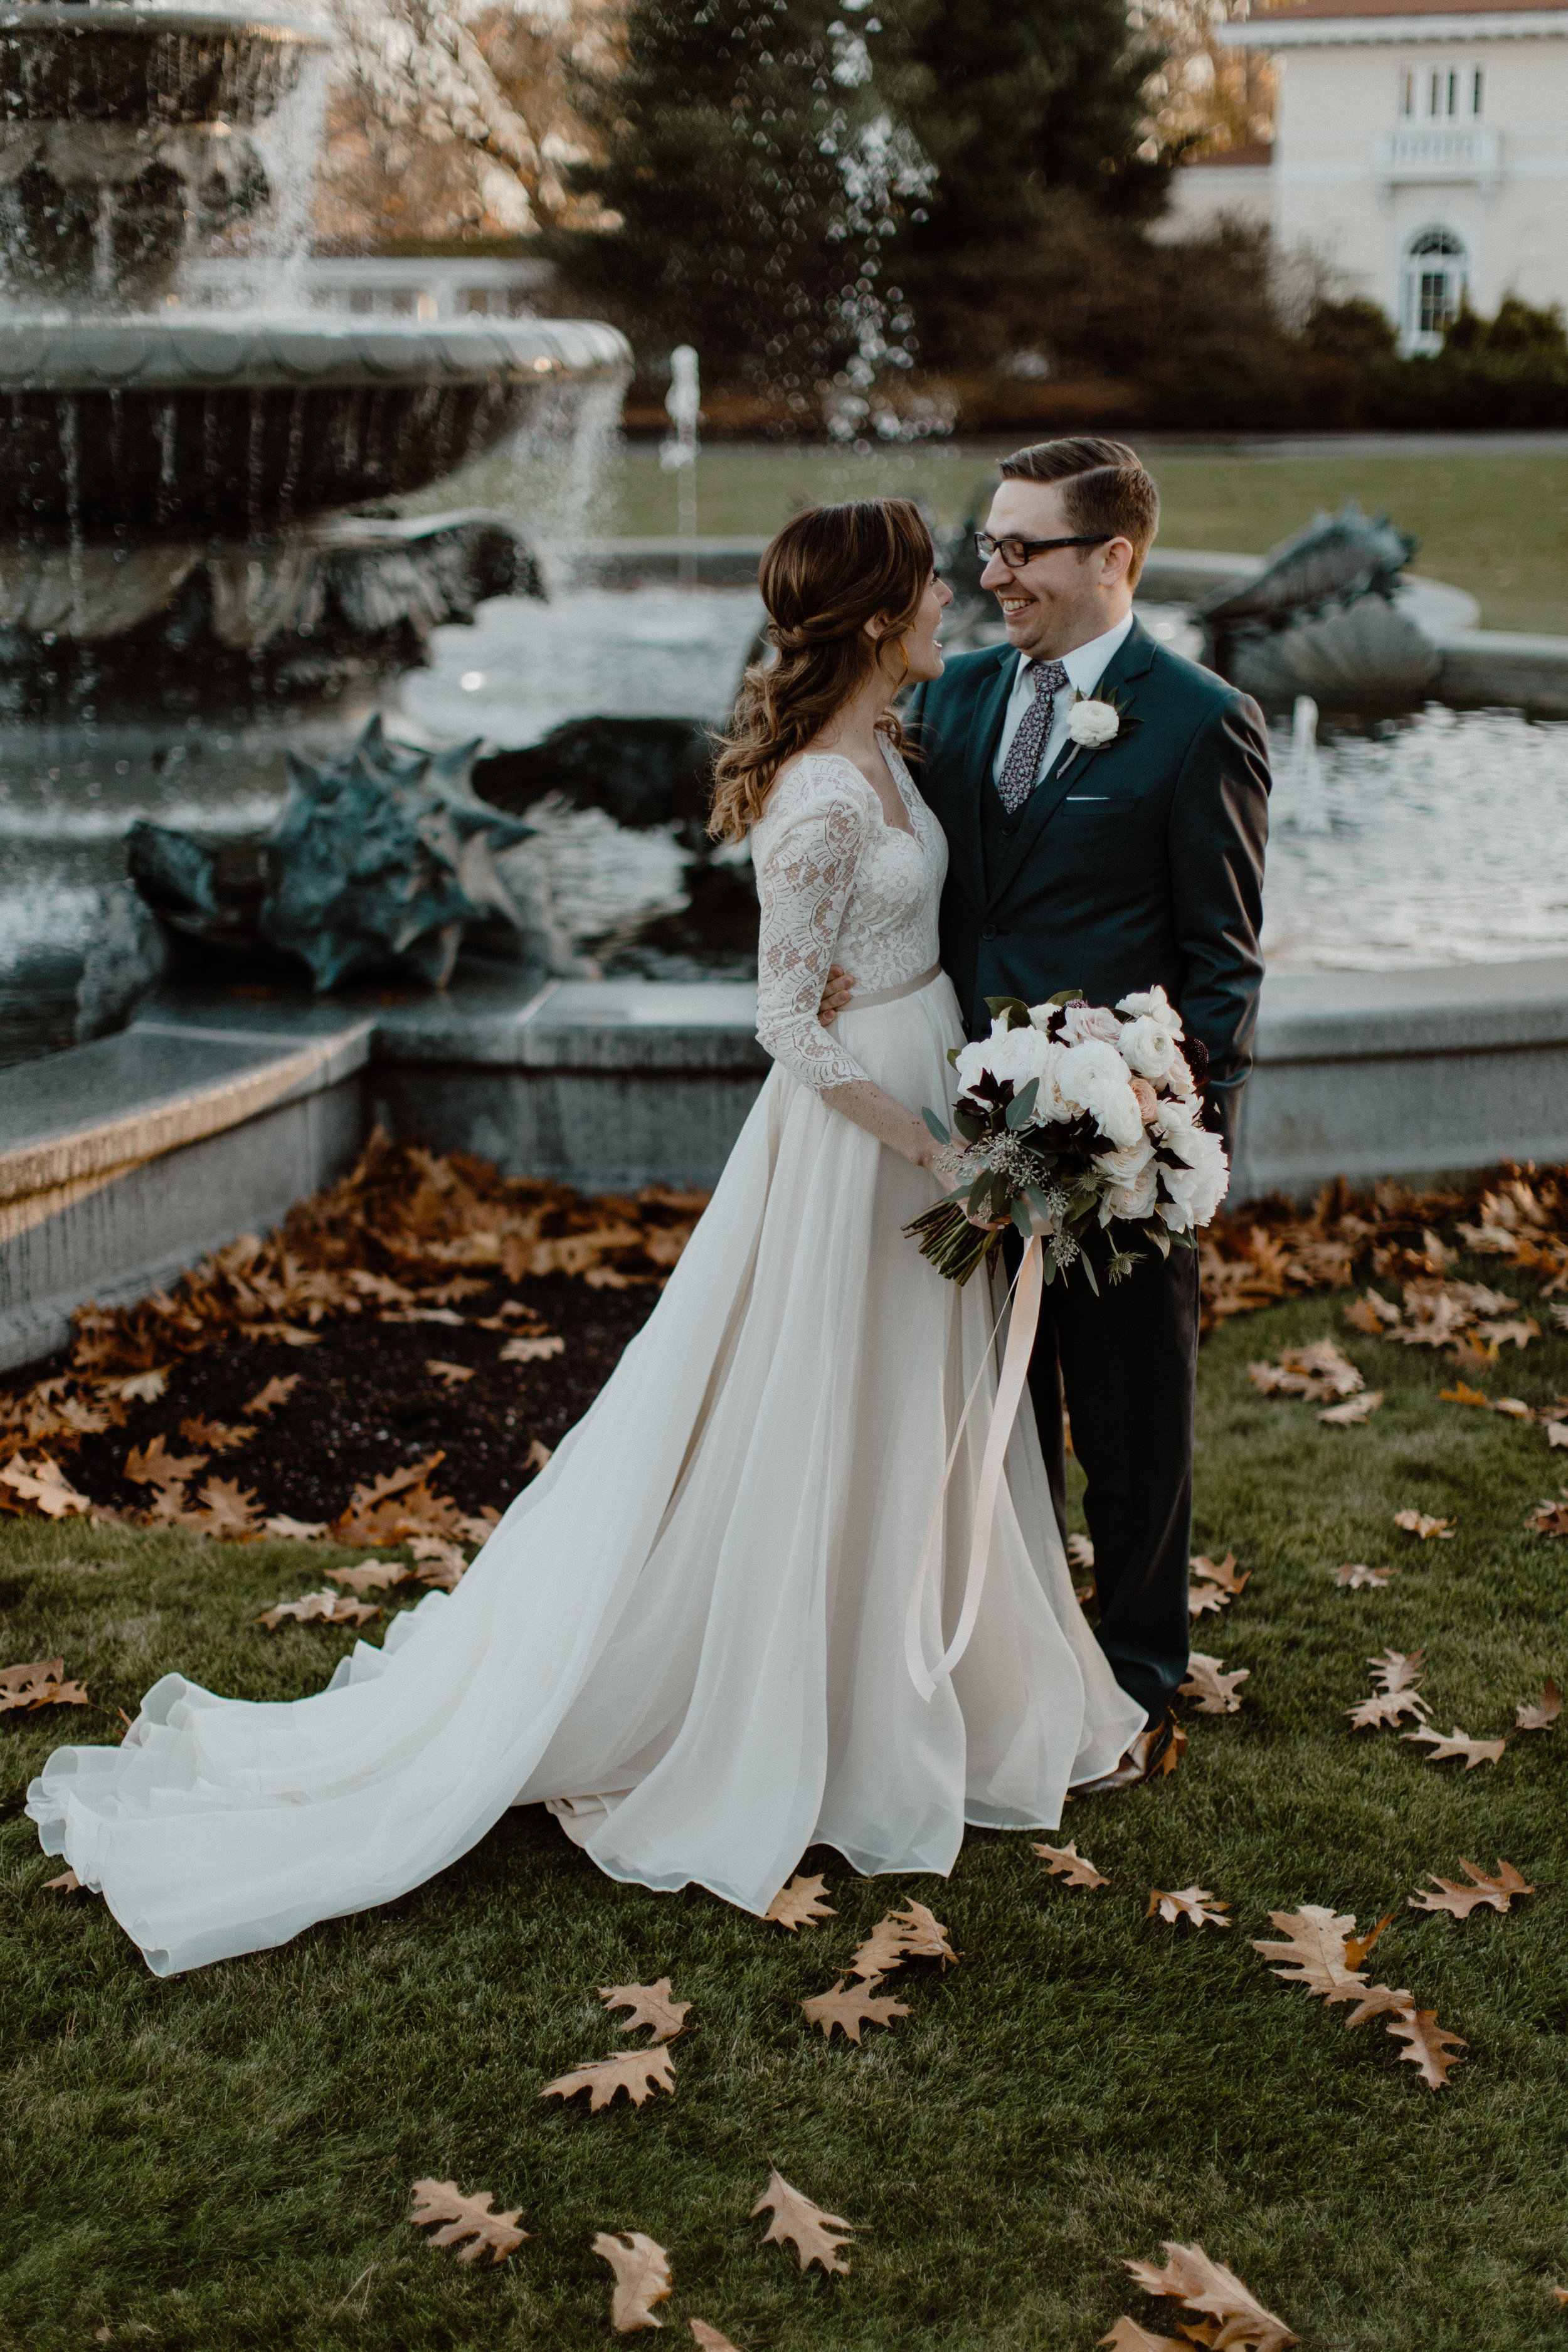 beverly_ma_wedding-24.jpg